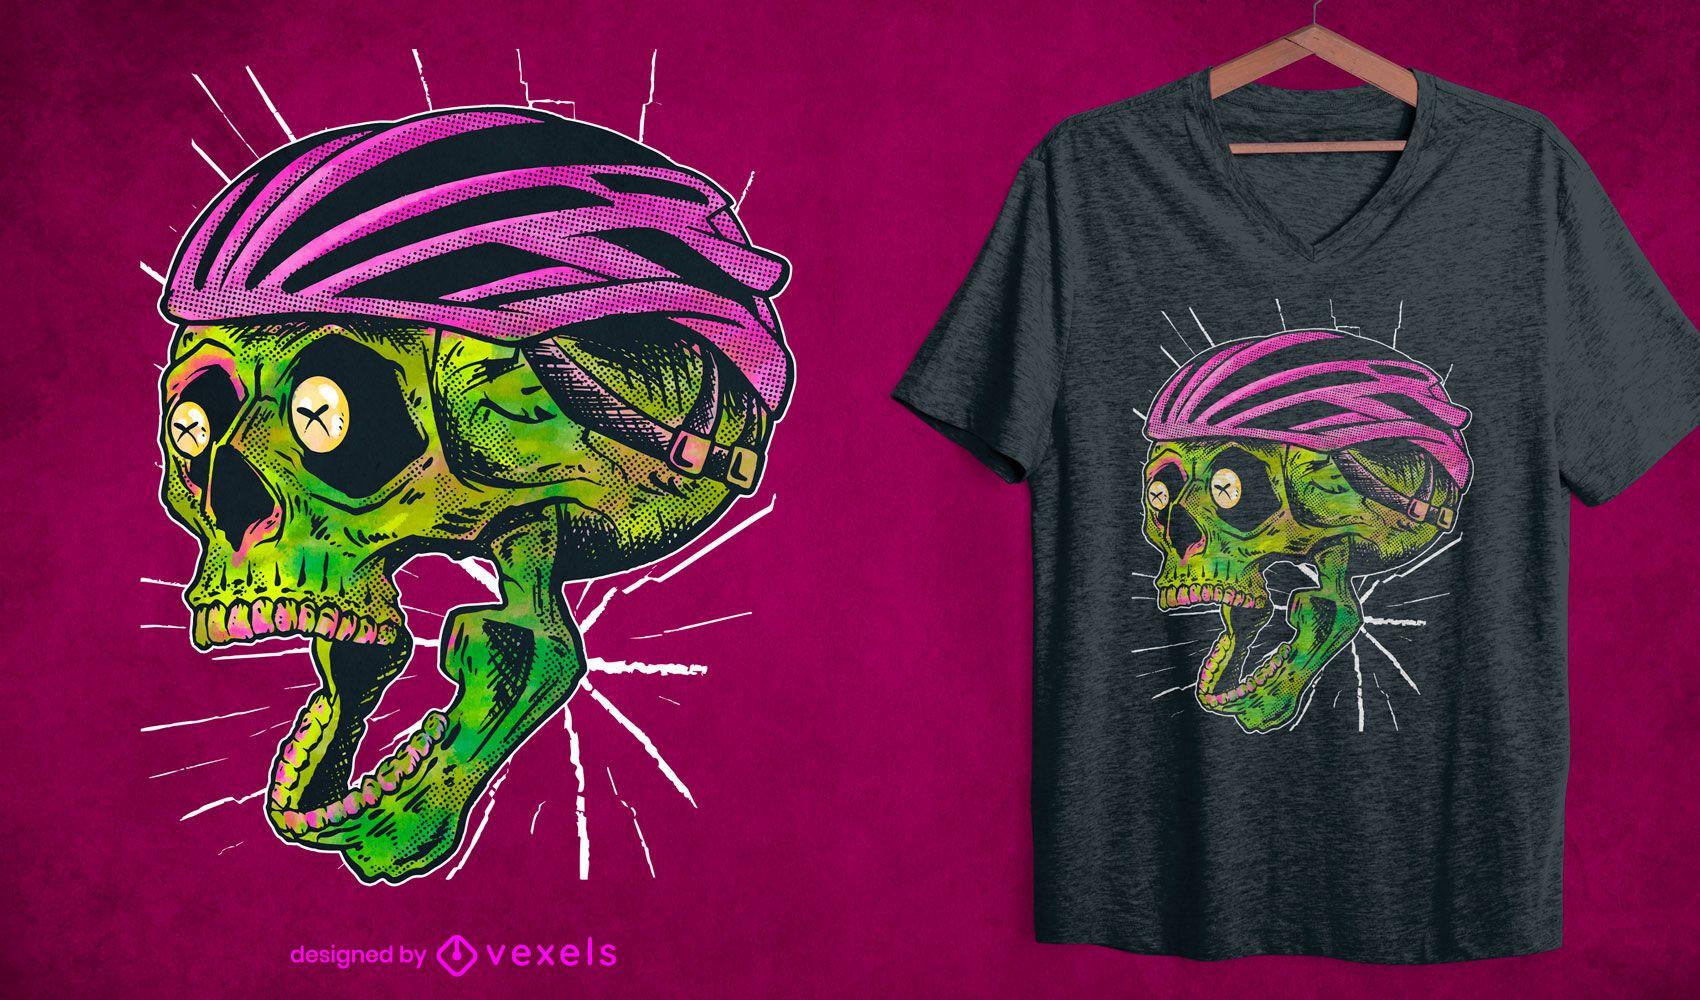 Cyclist skull t-shirt design